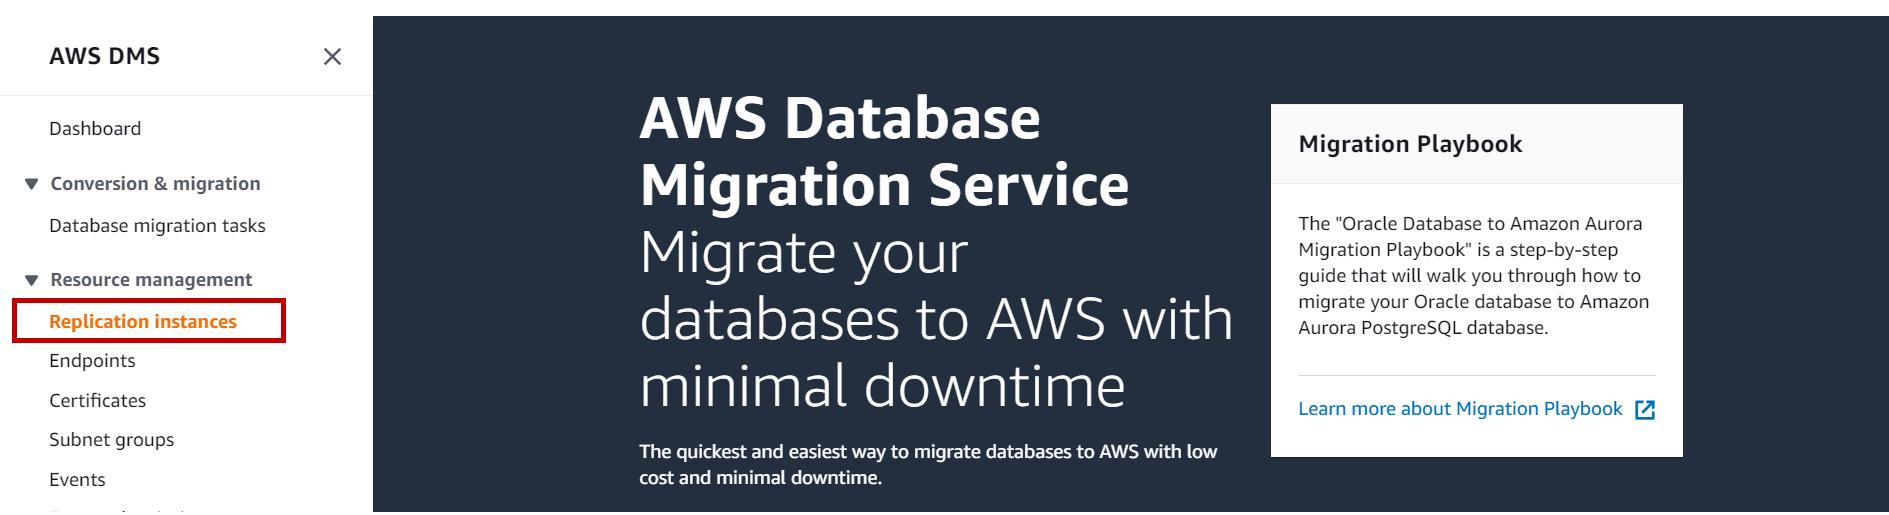 AWS RDS SQL Server Migration using AWS Database migration